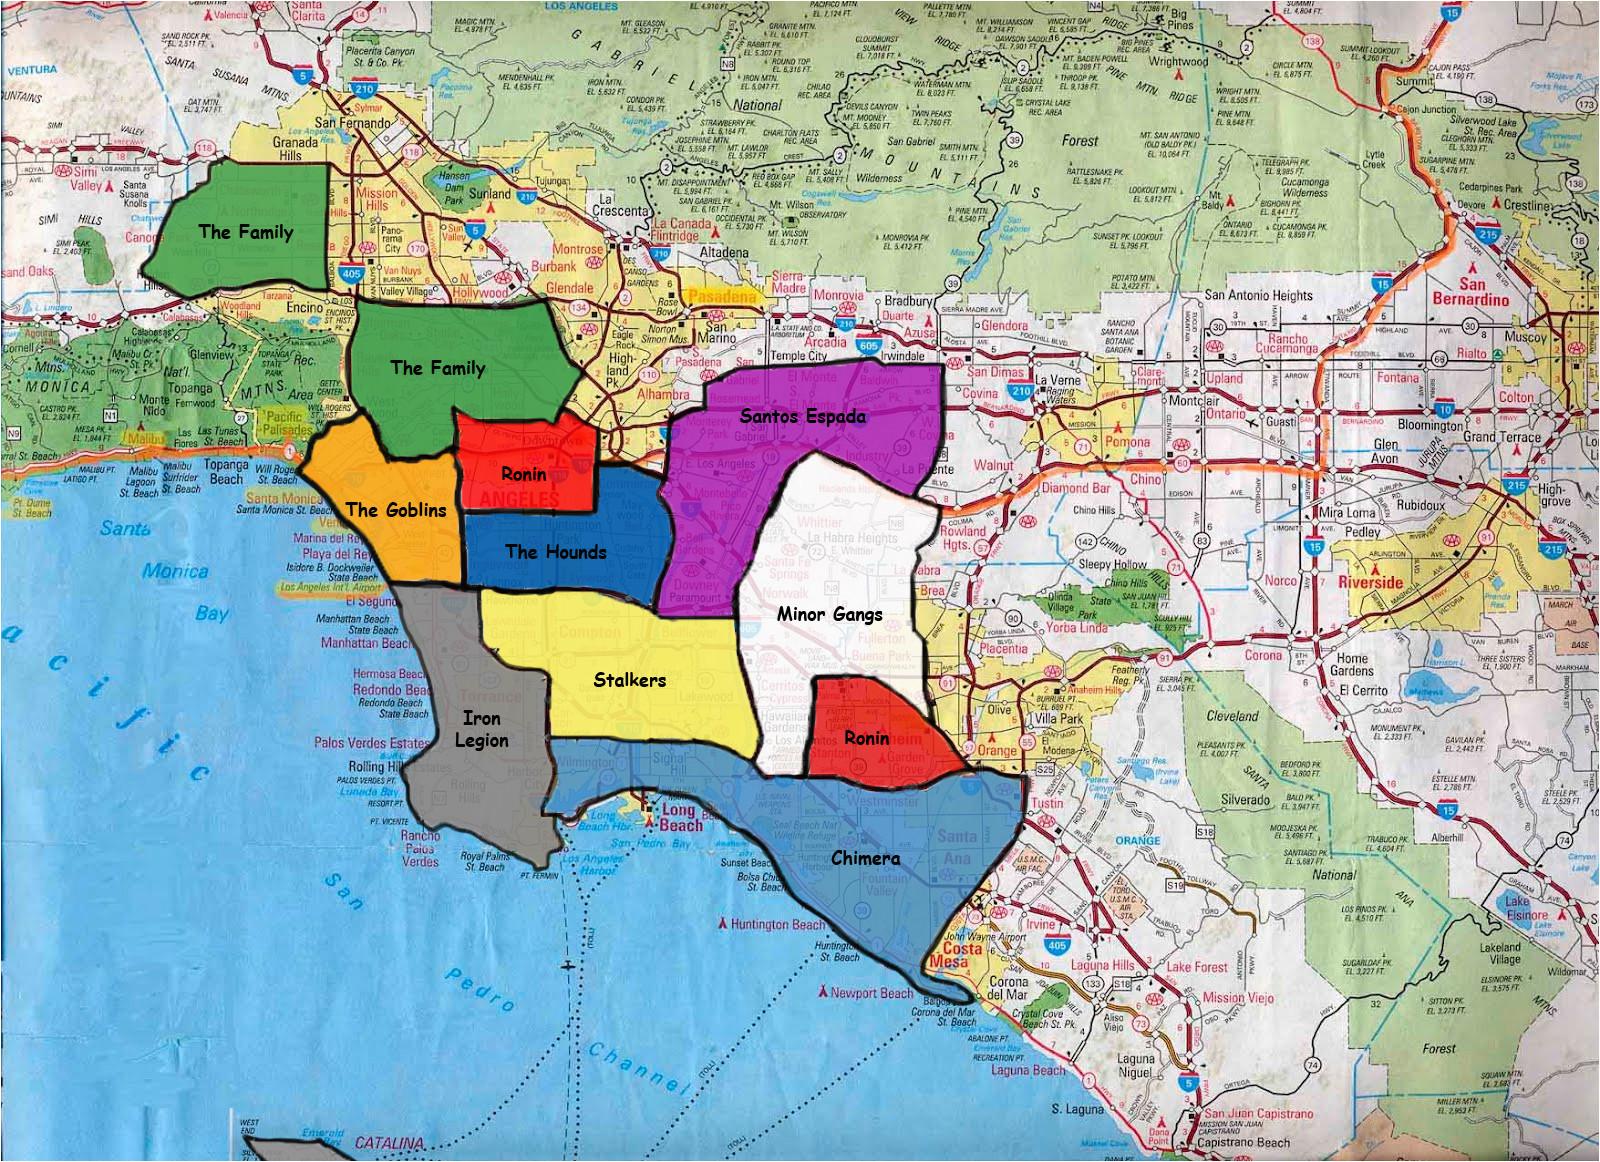 California Gang Map California Gang Territory Map California California Gang Territory